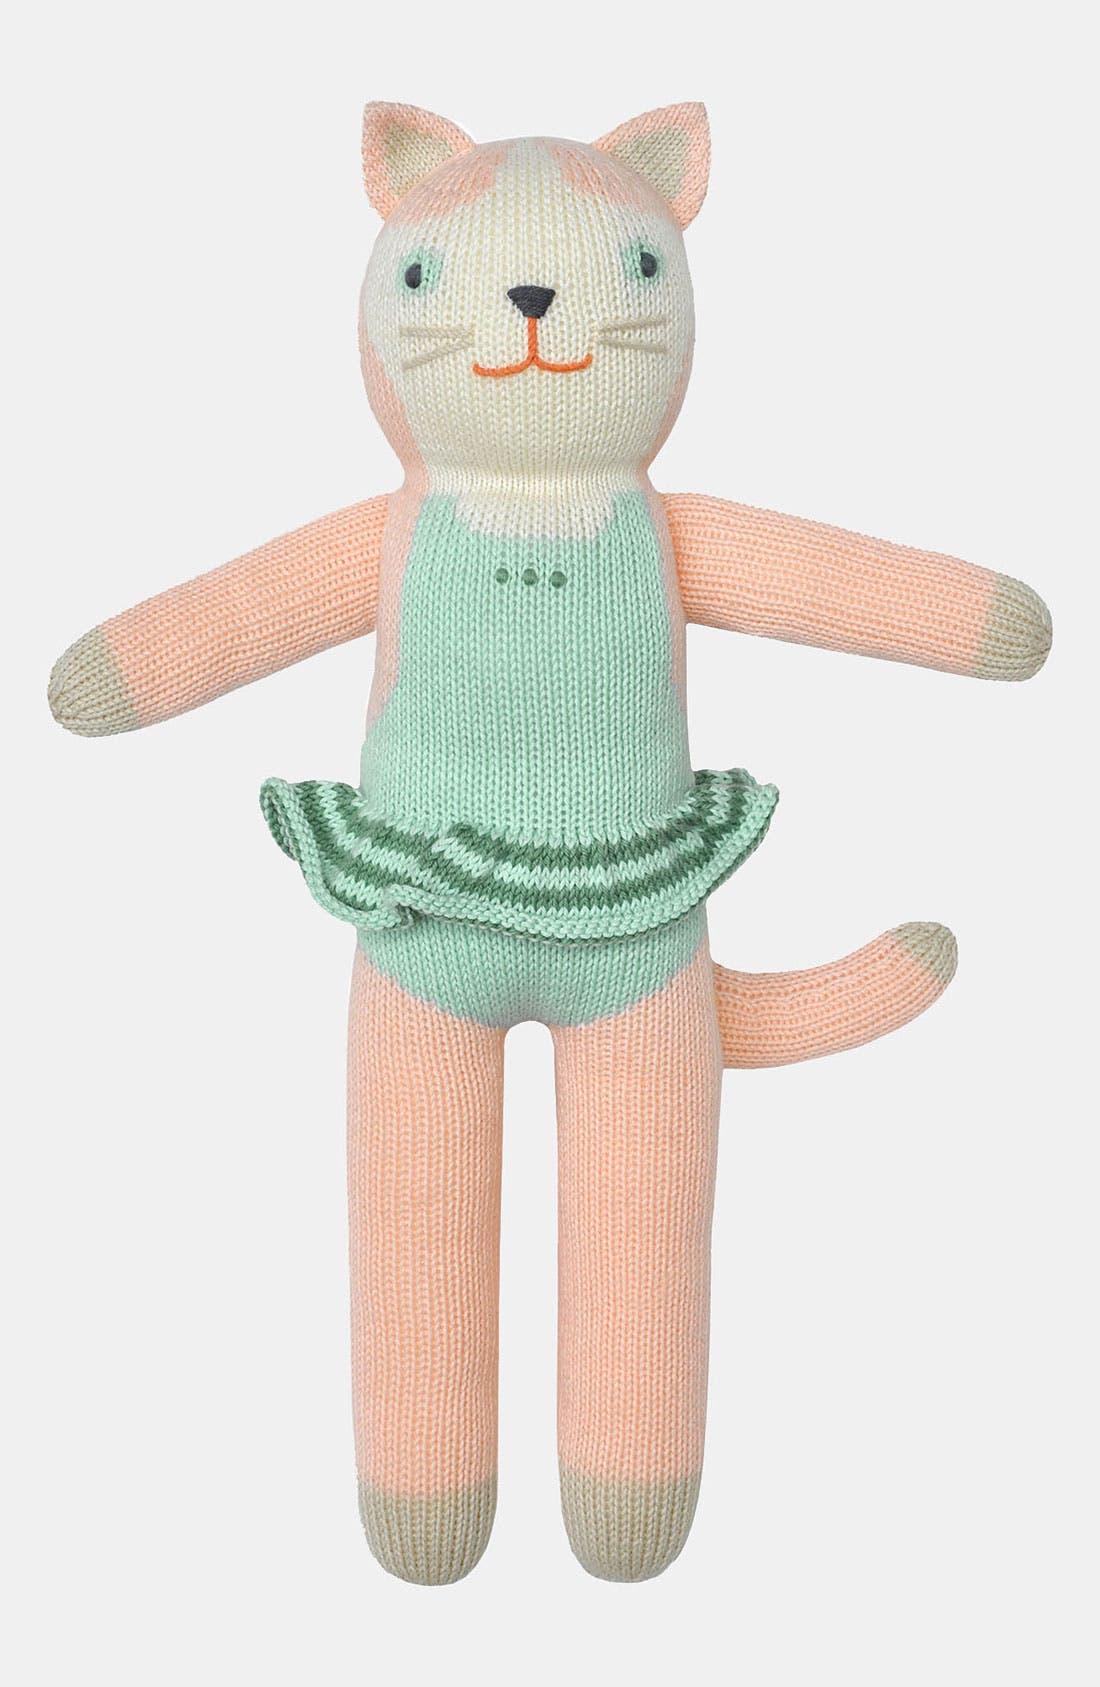 Alternate Image 1 Selected - Blabla 'Splash the Cat' Knit Doll